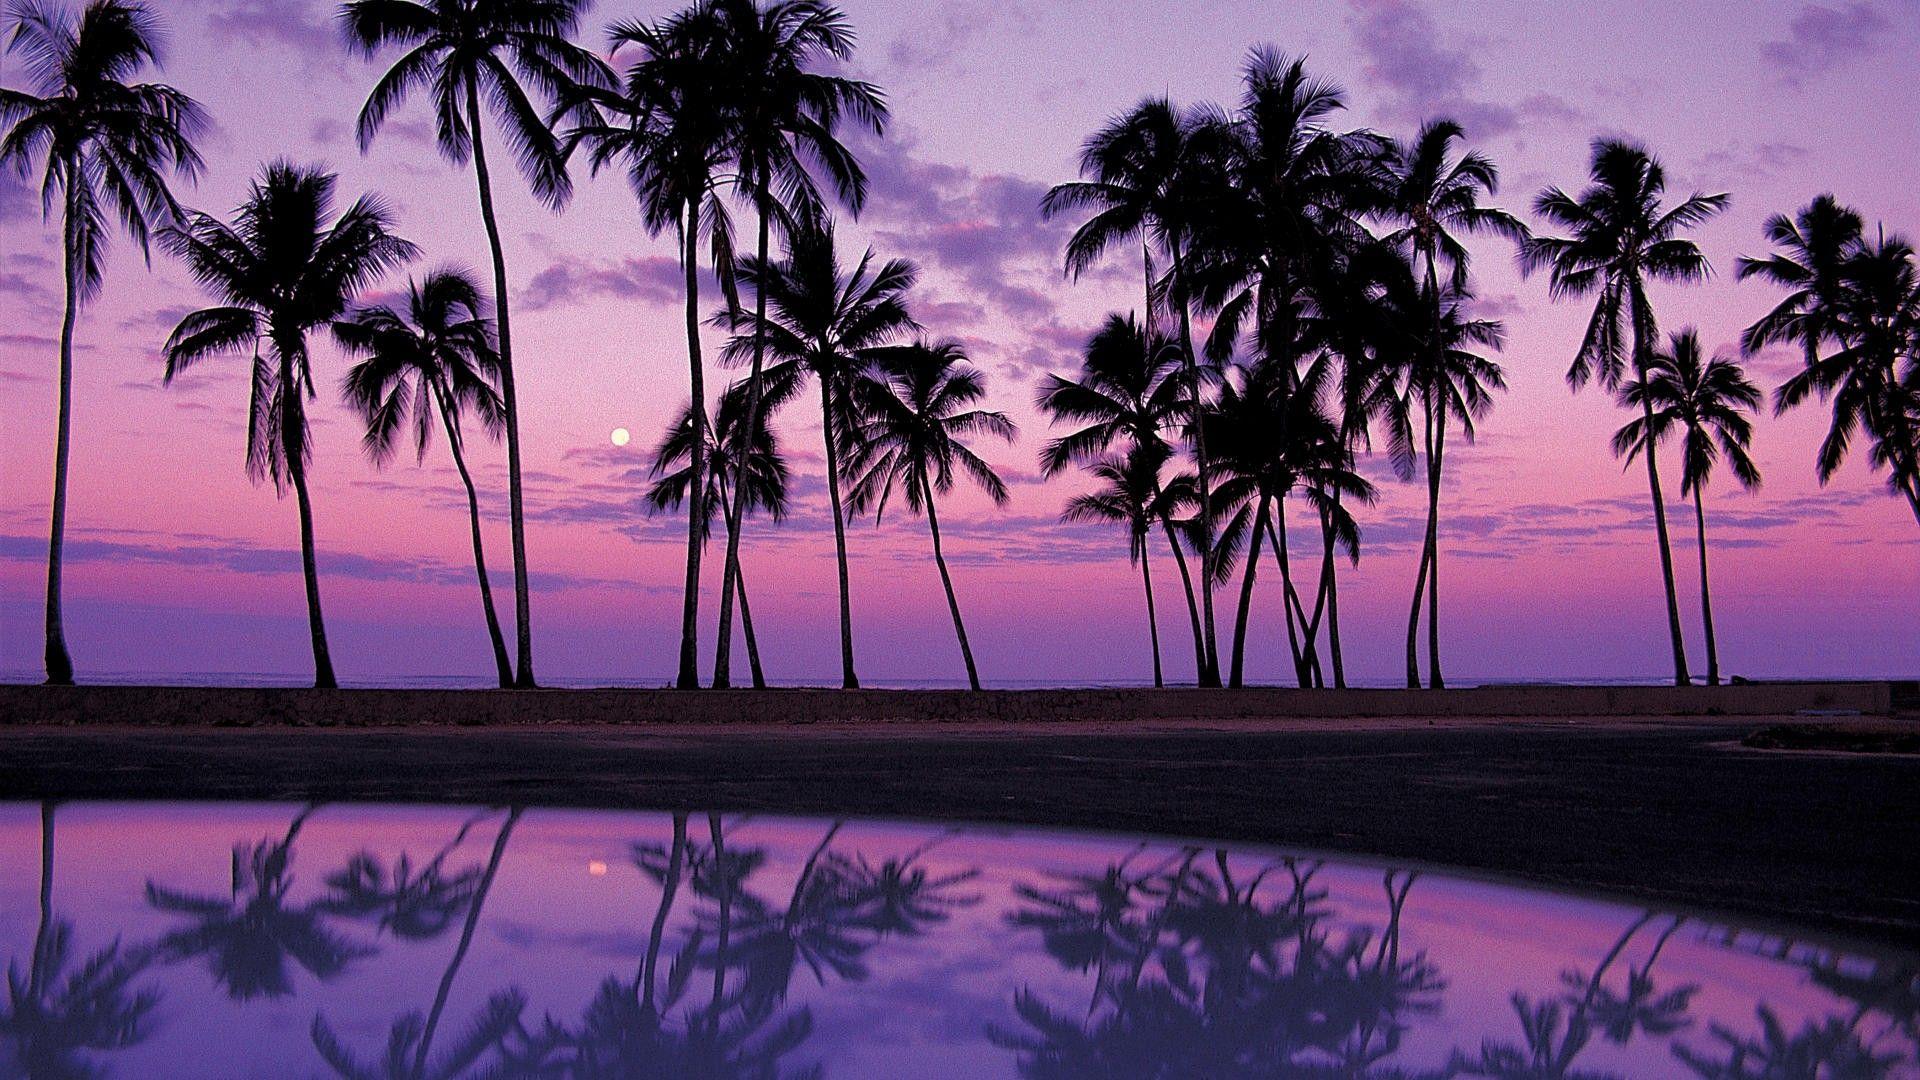 Palm Tree Backgrounds Wallpapers Backgrounds Images Art Photos Beach Sunset Wallpaper Sunset Wallpaper Purple Sunset